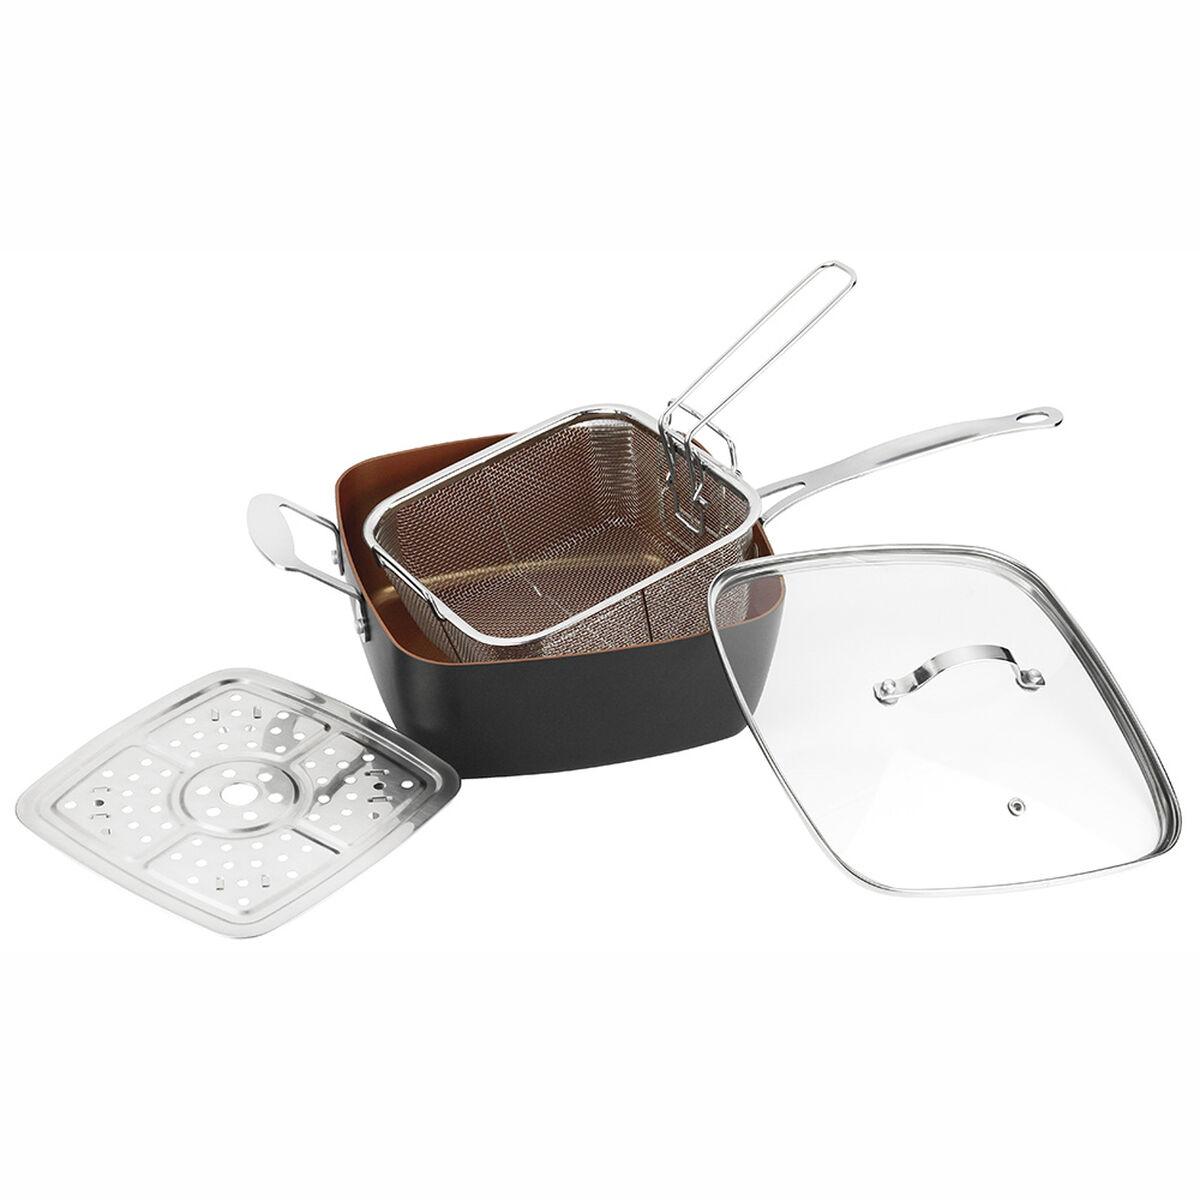 Sartén Olla Aluminio Multiuso Marmicoc Spring Negro 24 Cm